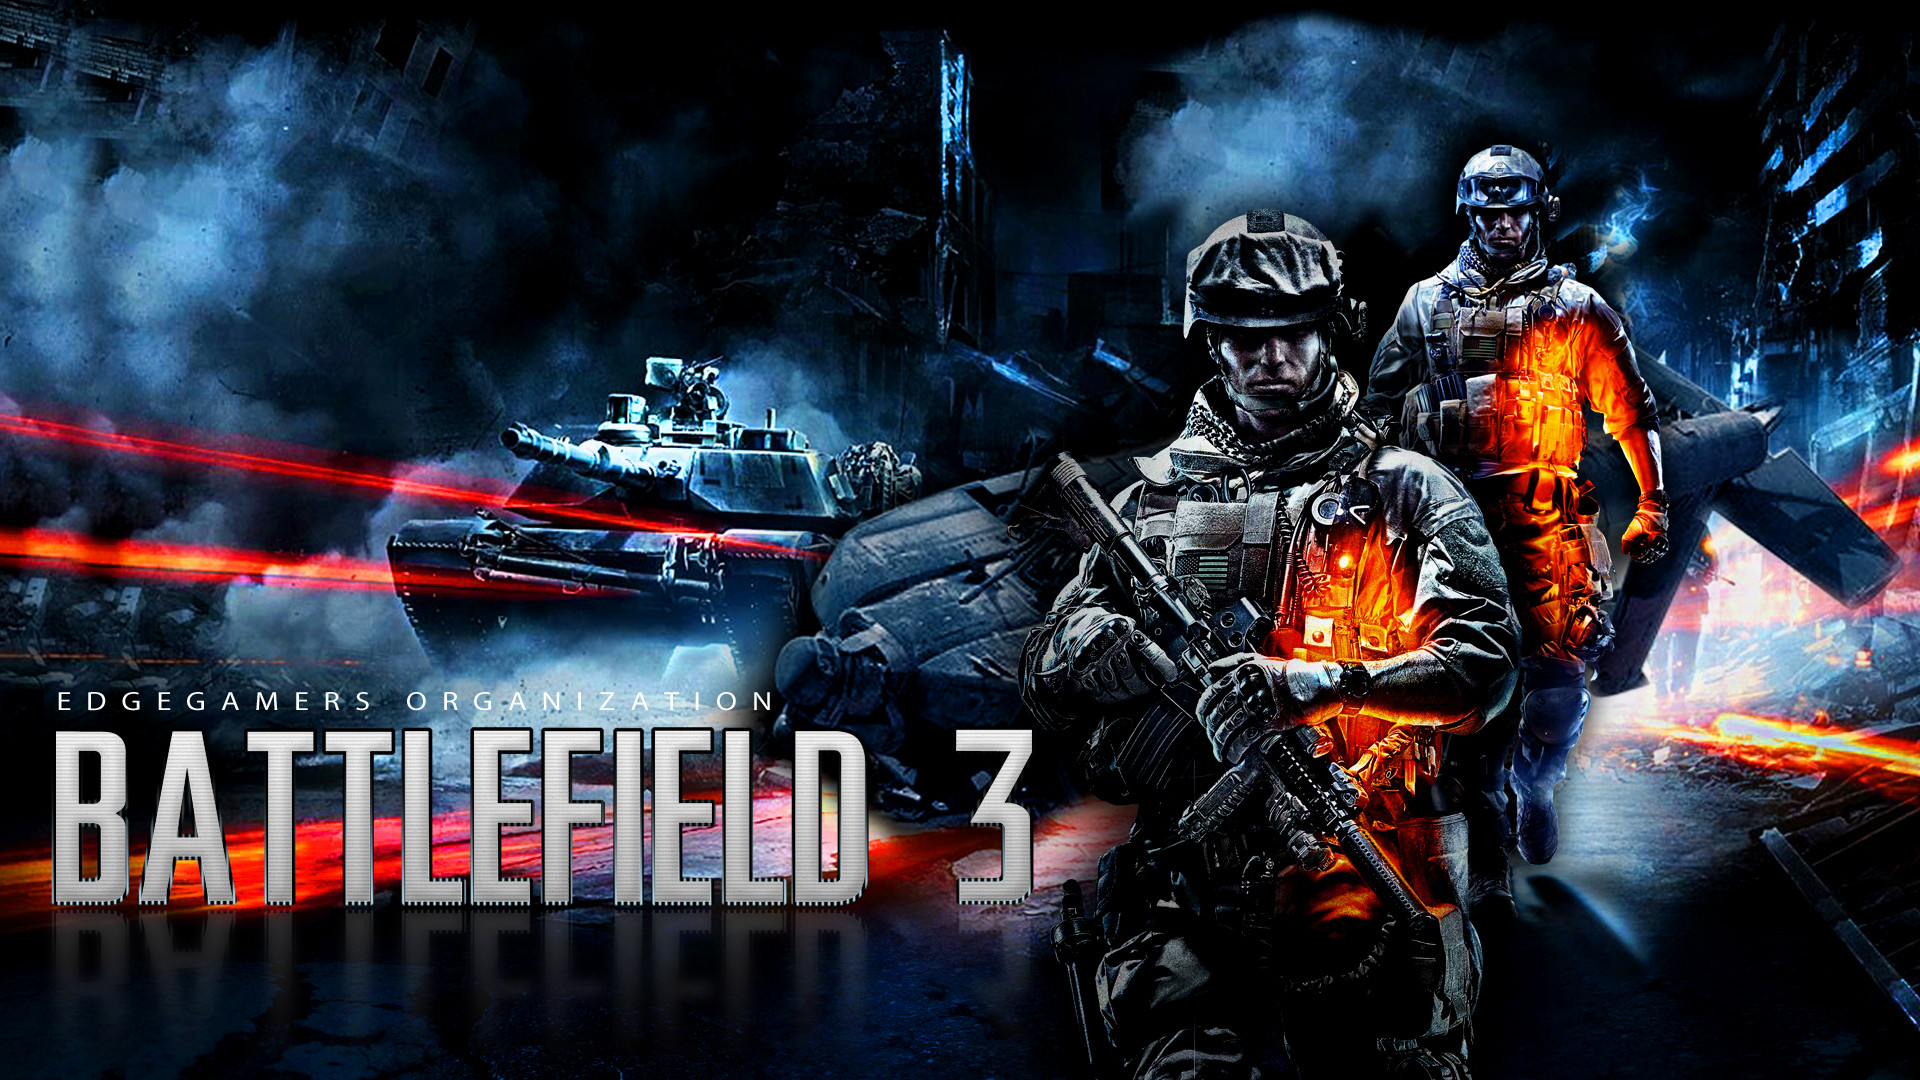 Res: 1920x1080, June.2018, Battlefield 3 Wallpapers HD